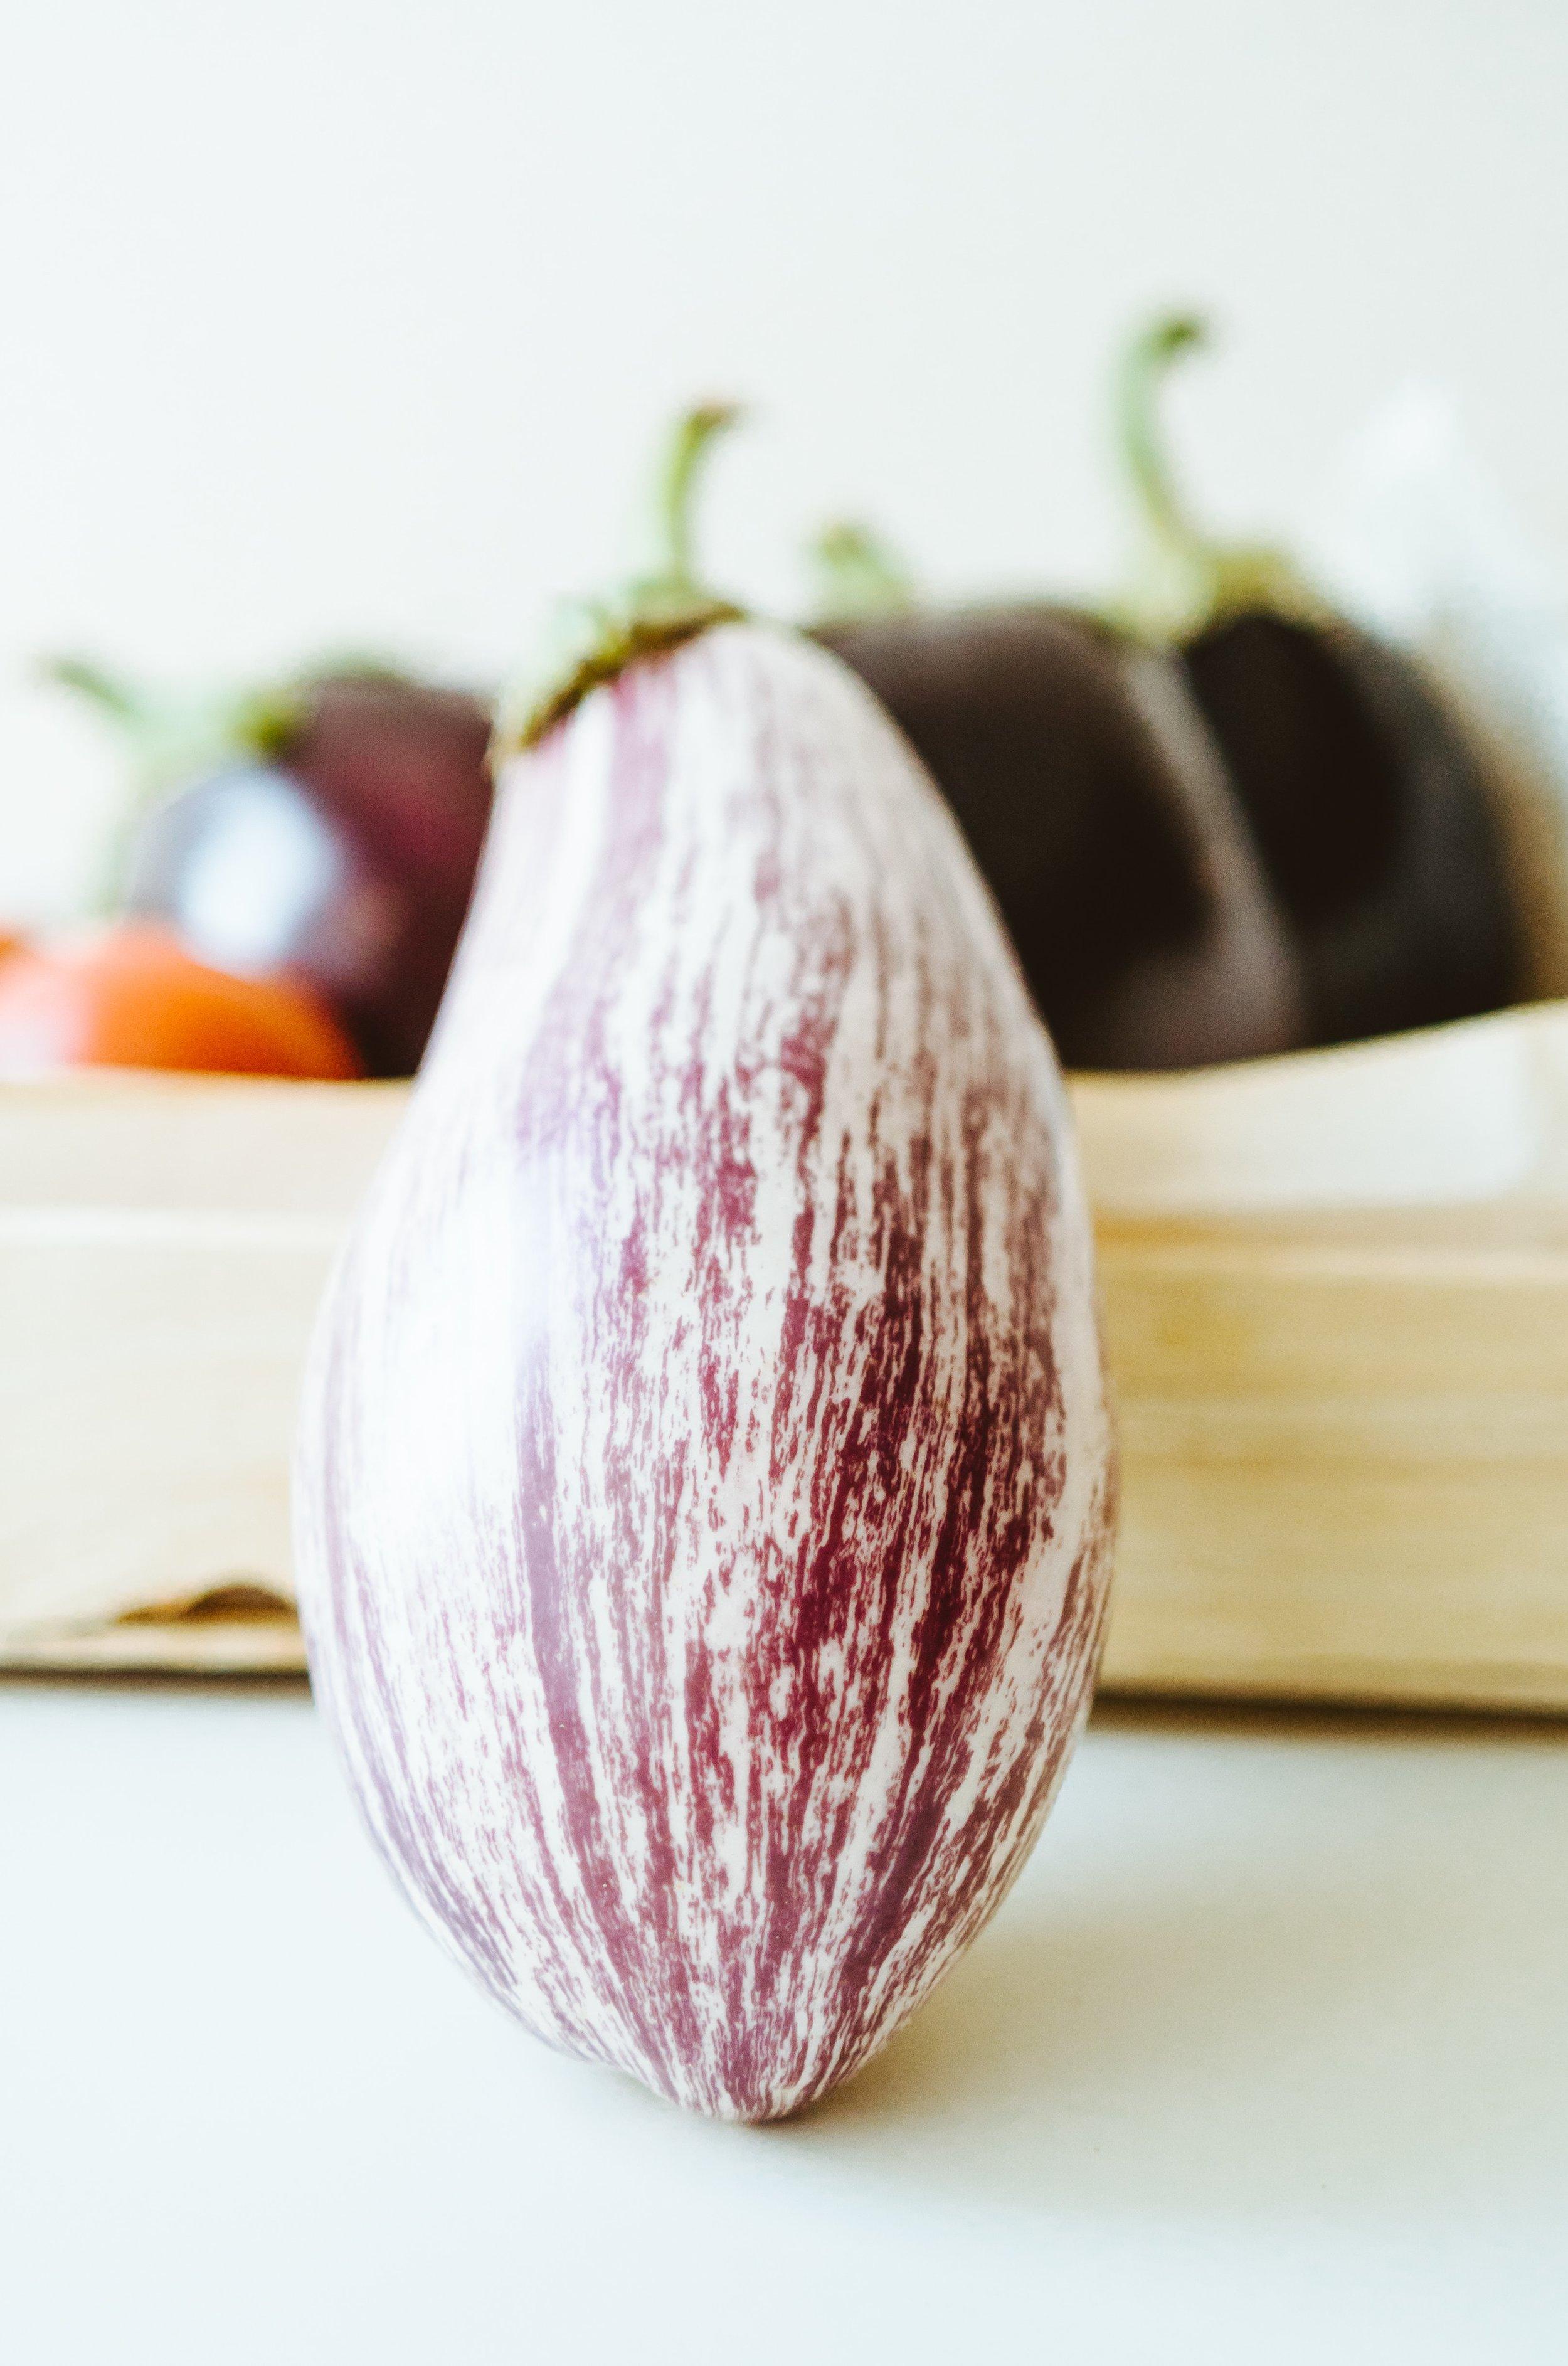 delicious-eggplant-food-1340857.jpg